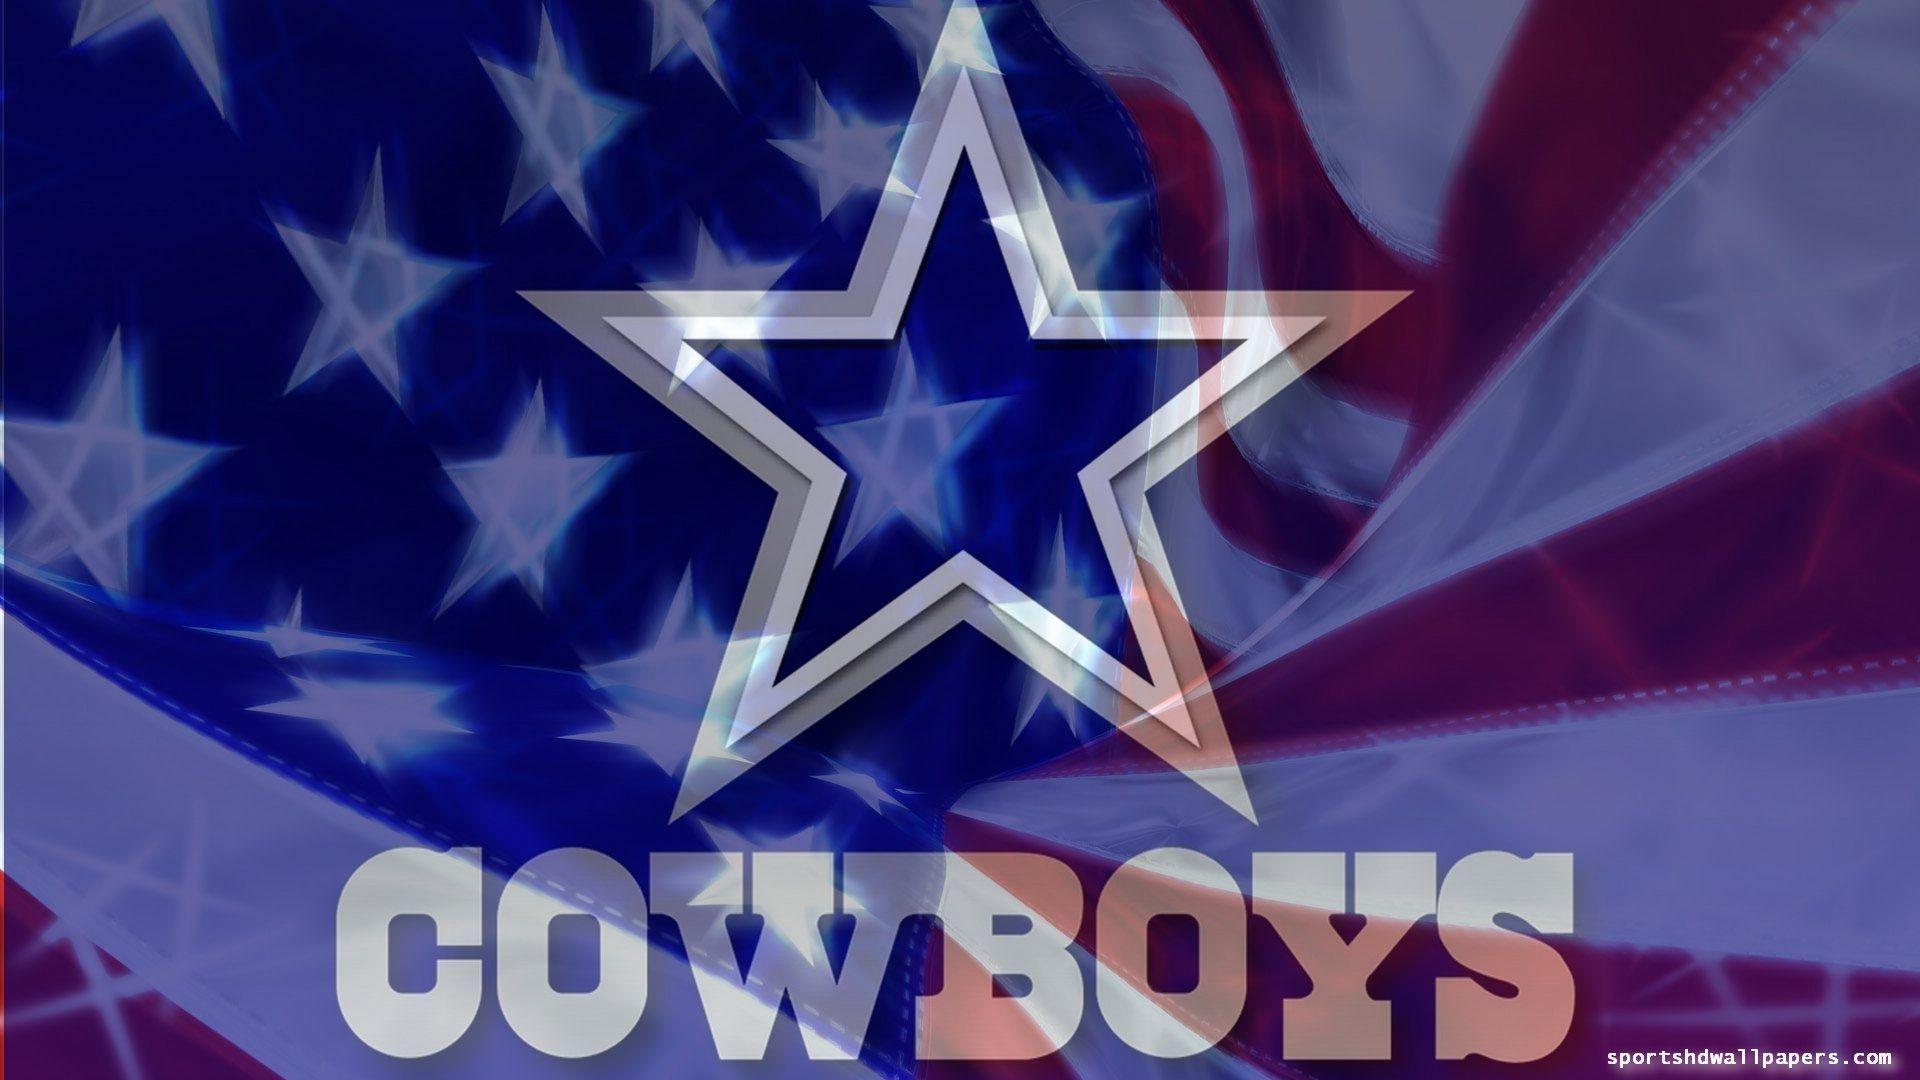 Screensaver Dallas Cowboys 2019 - HD Wallpaper